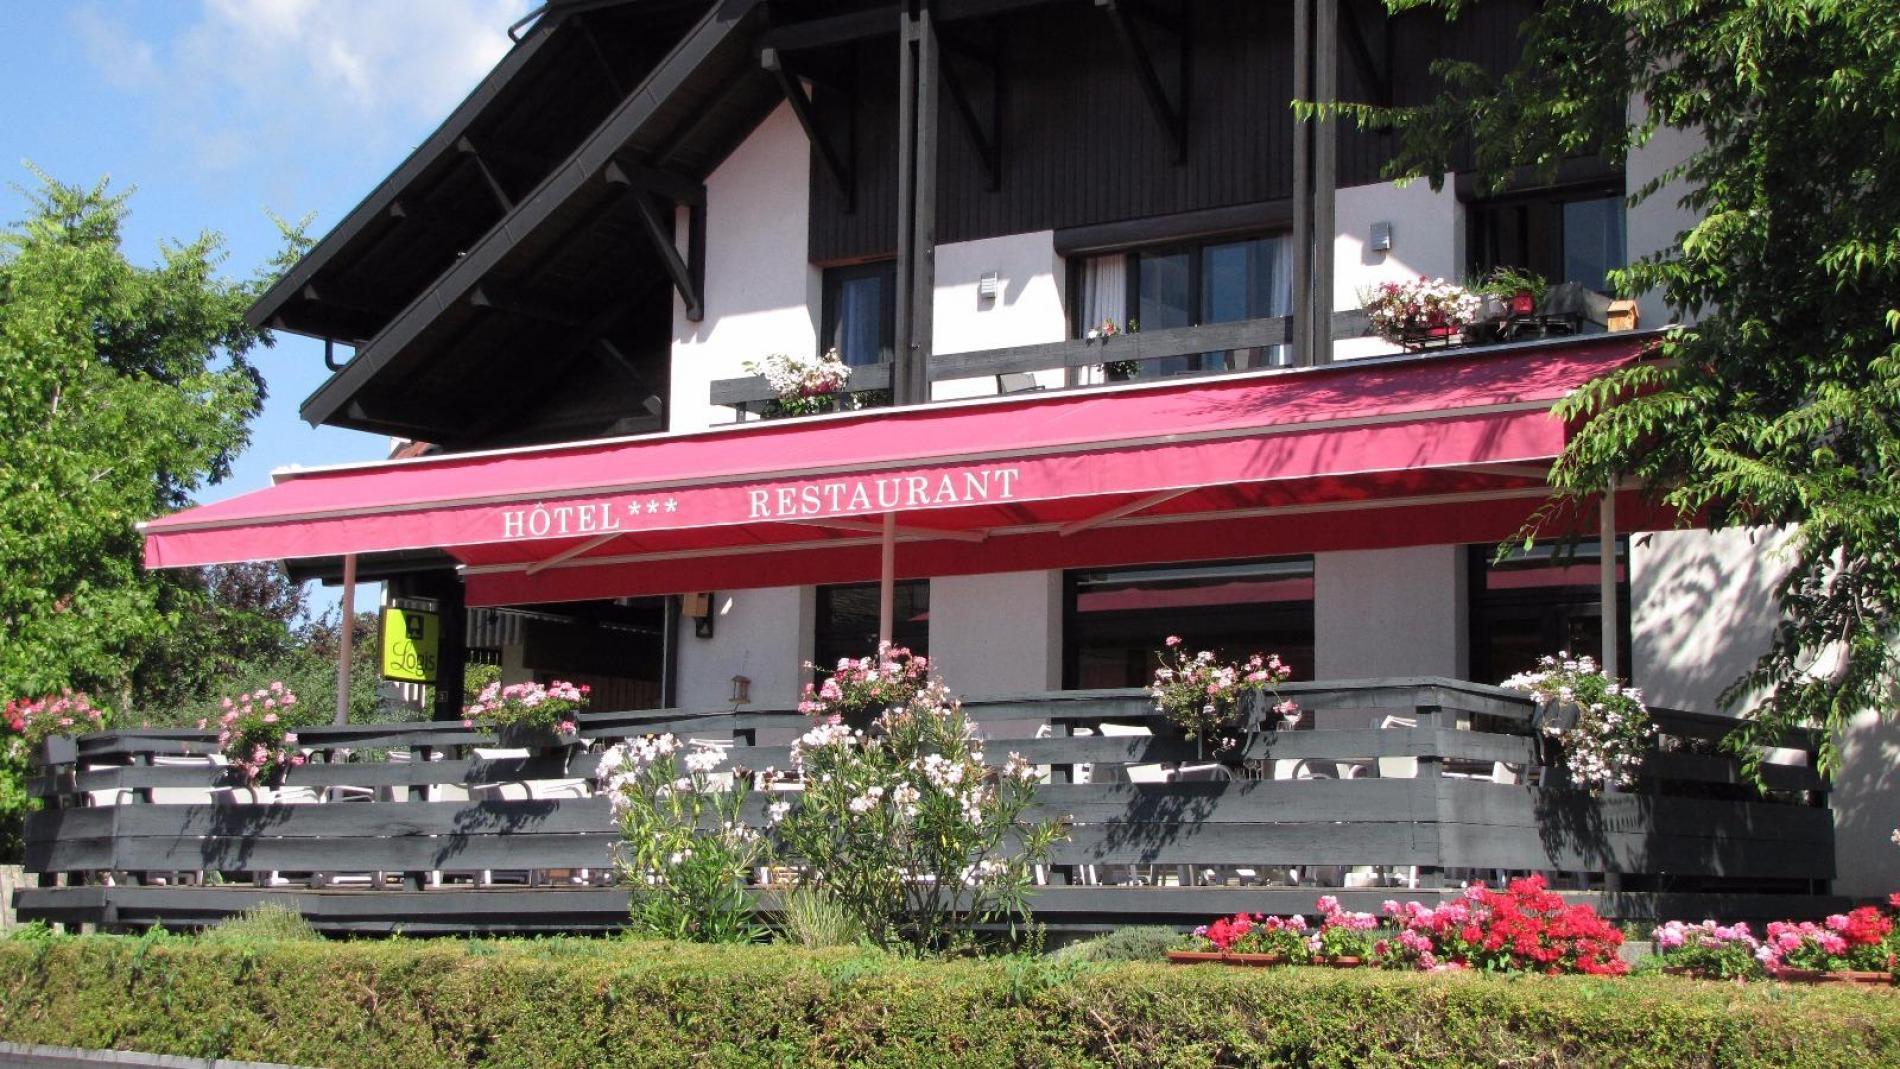 Logis Hôtel Auberge Restaurant d'Argonay